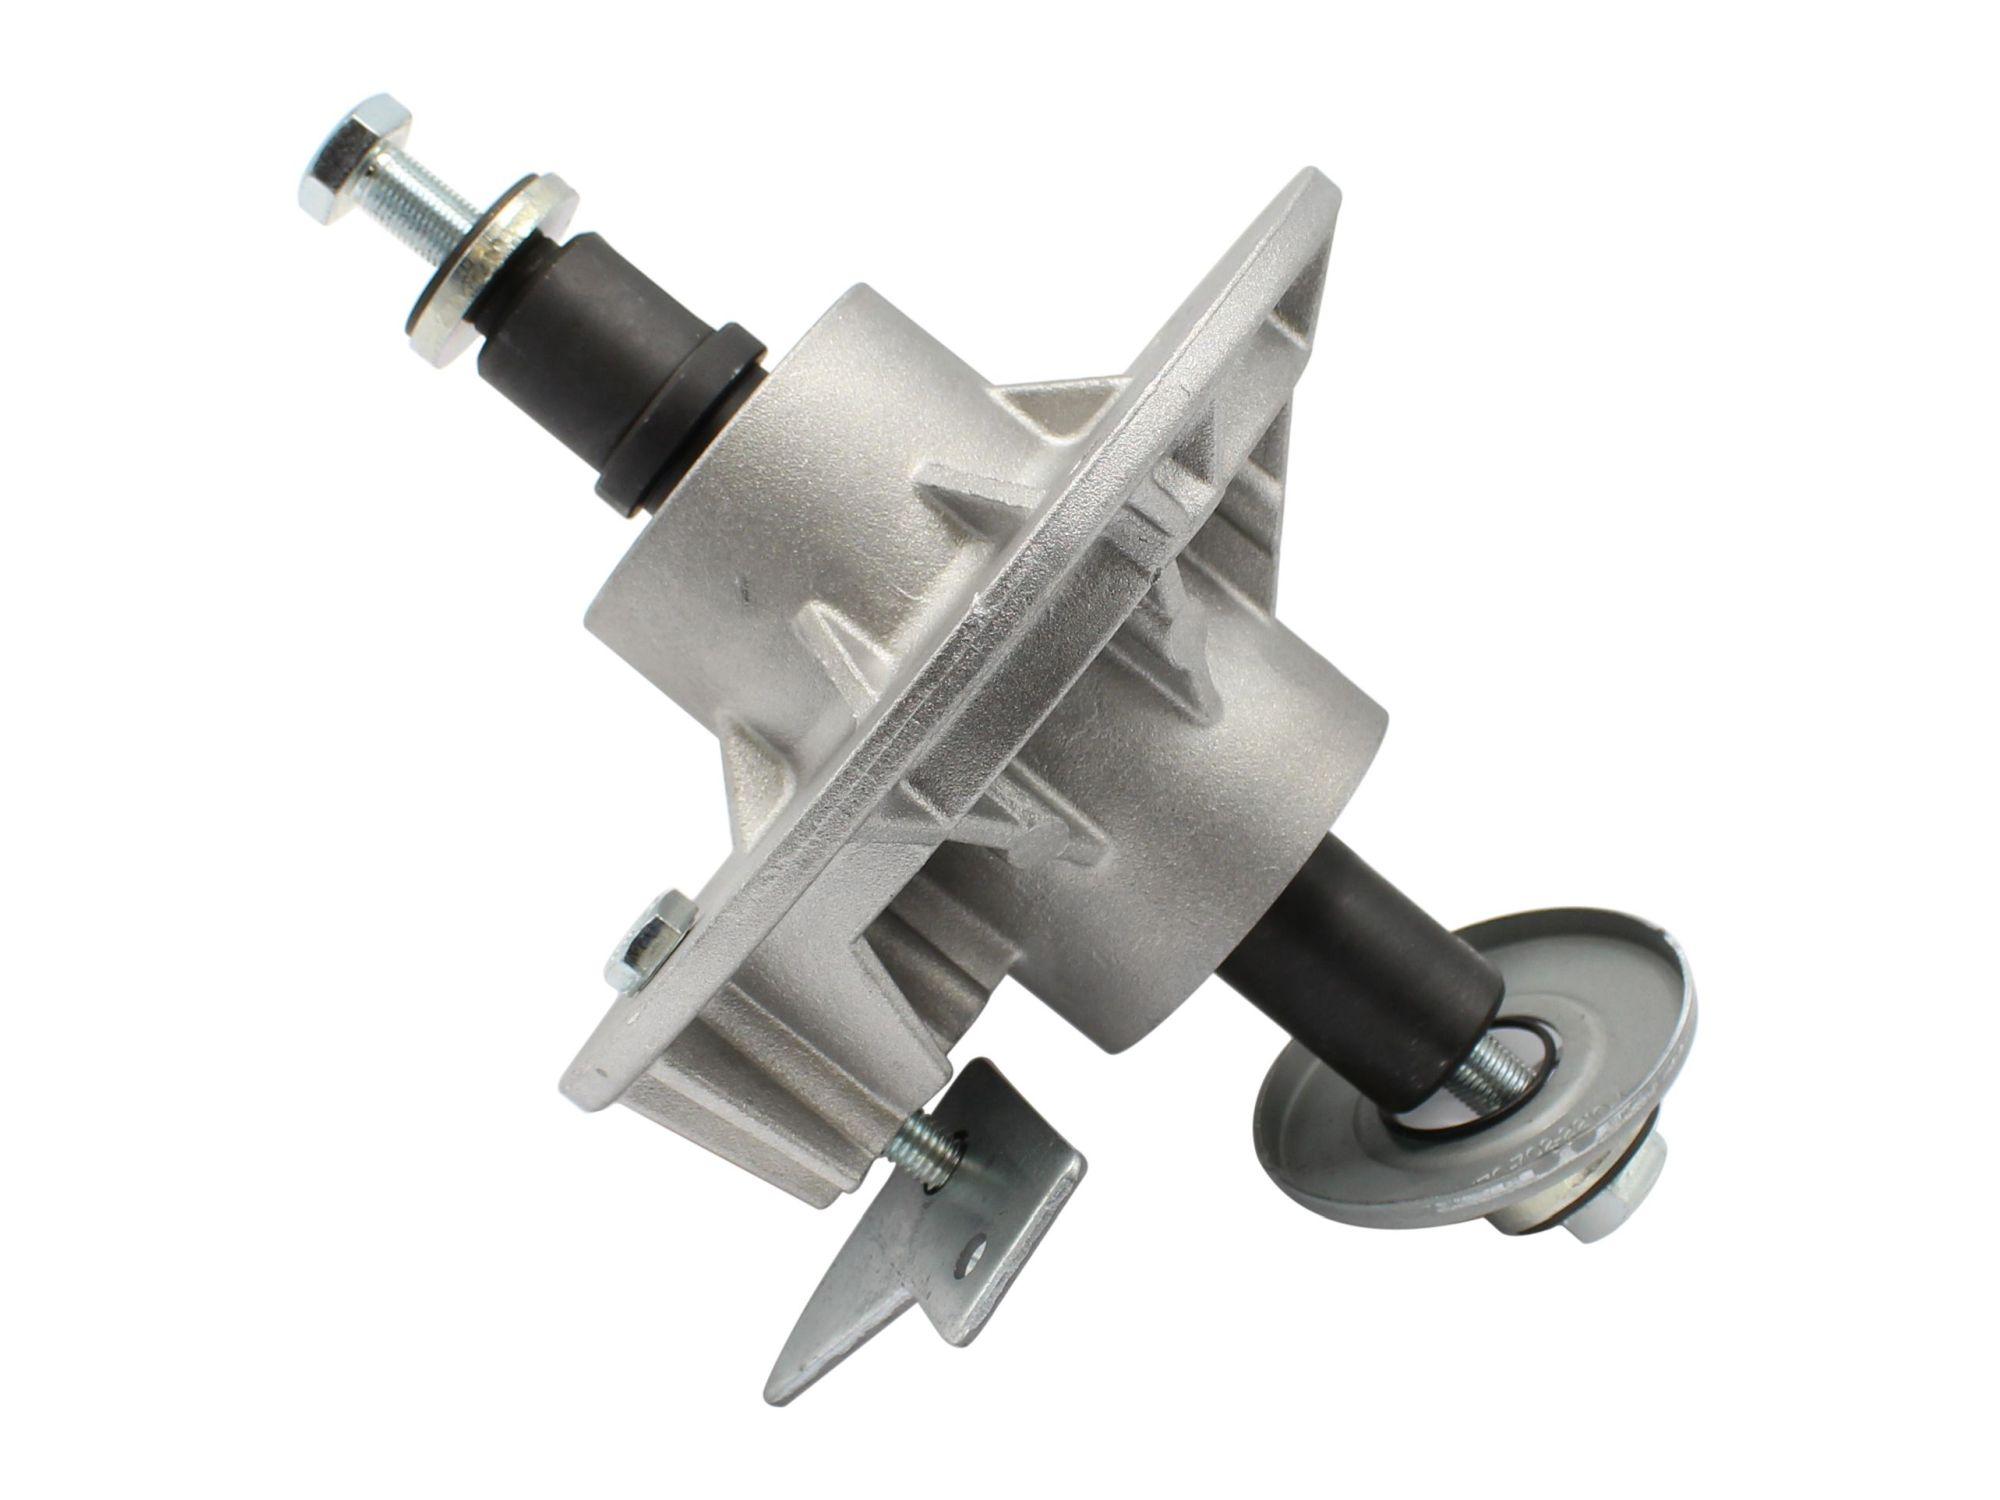 2 X 49 CM Messer für AL-KO T Comfort T 950 16-92 HD HD-H 13-92 17-92 LUX HVC